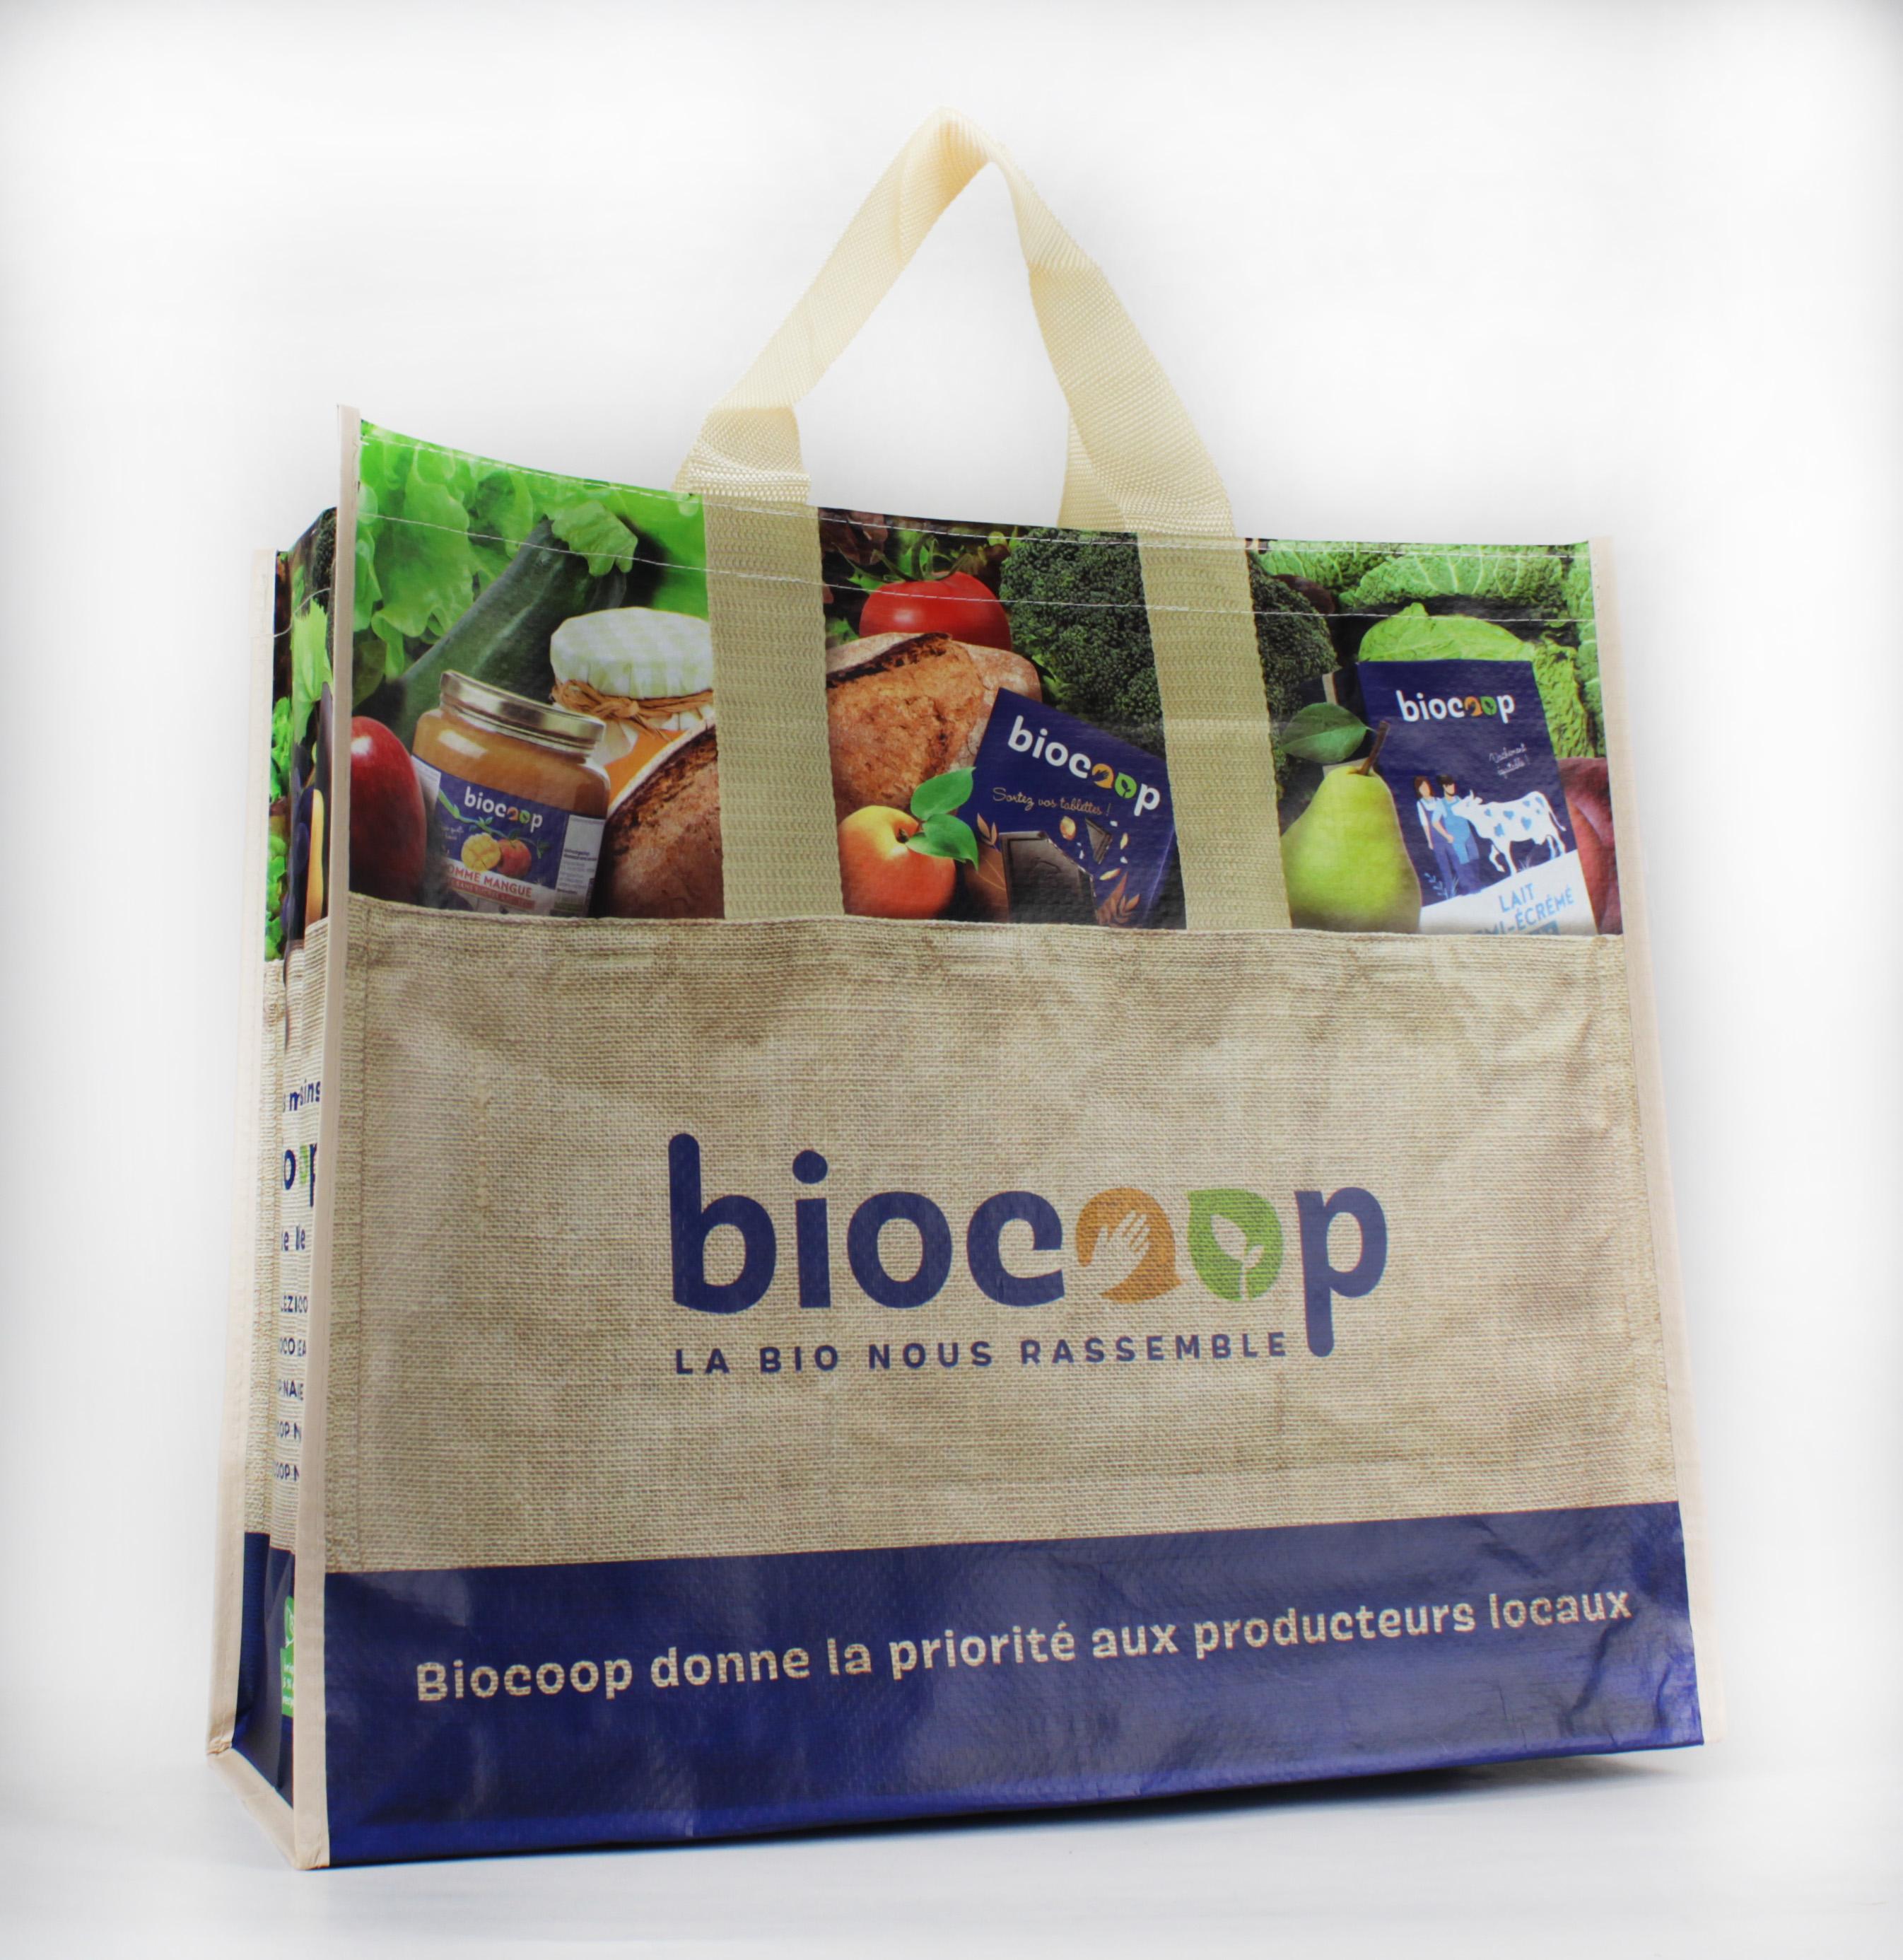 Sac personnalisé Biocoop